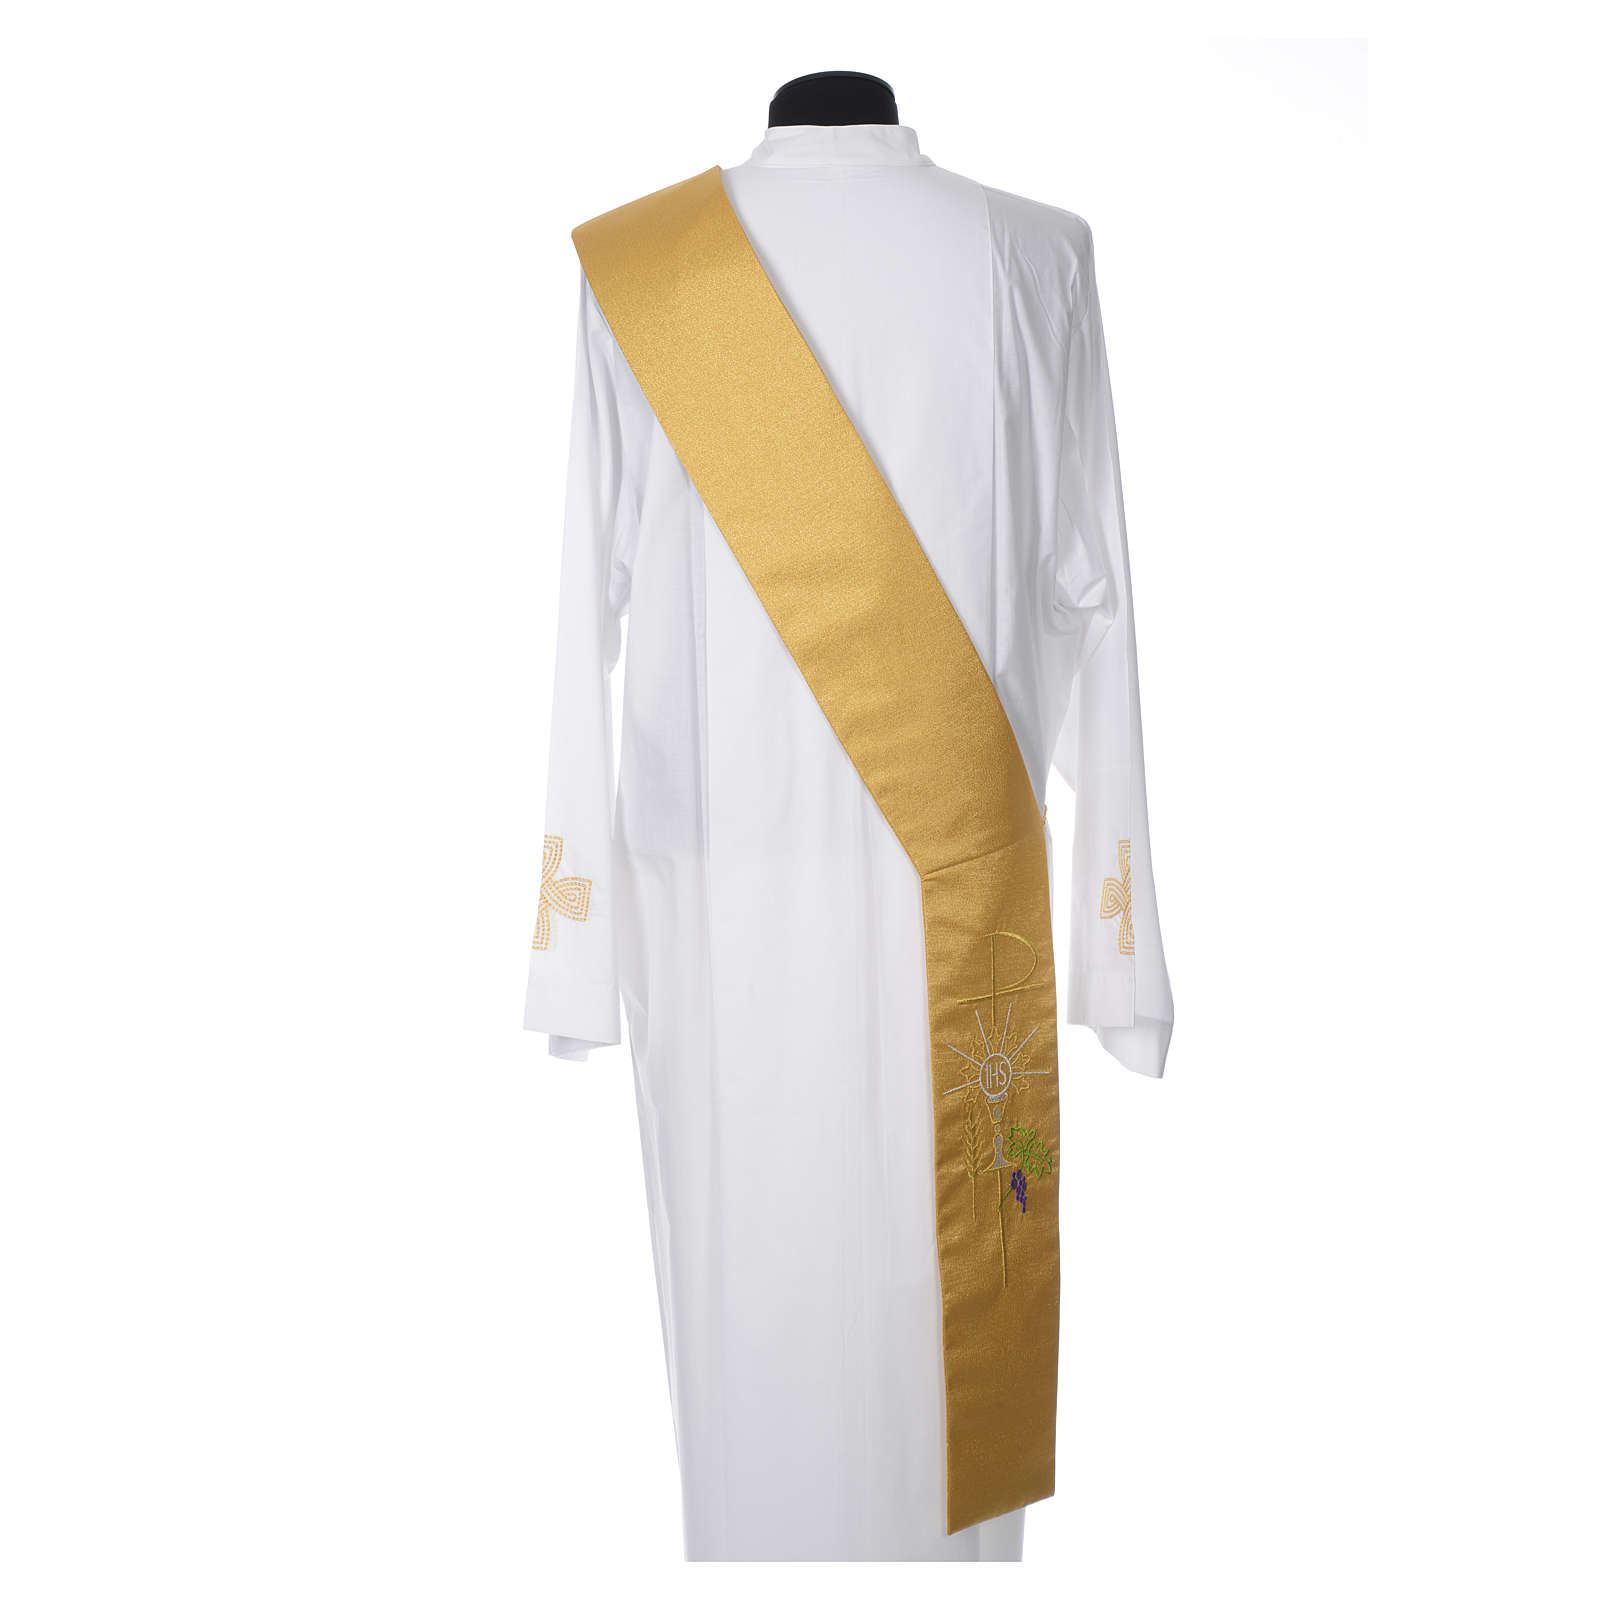 Stola diaconale 100% poliestere calice ostia uva oro 4